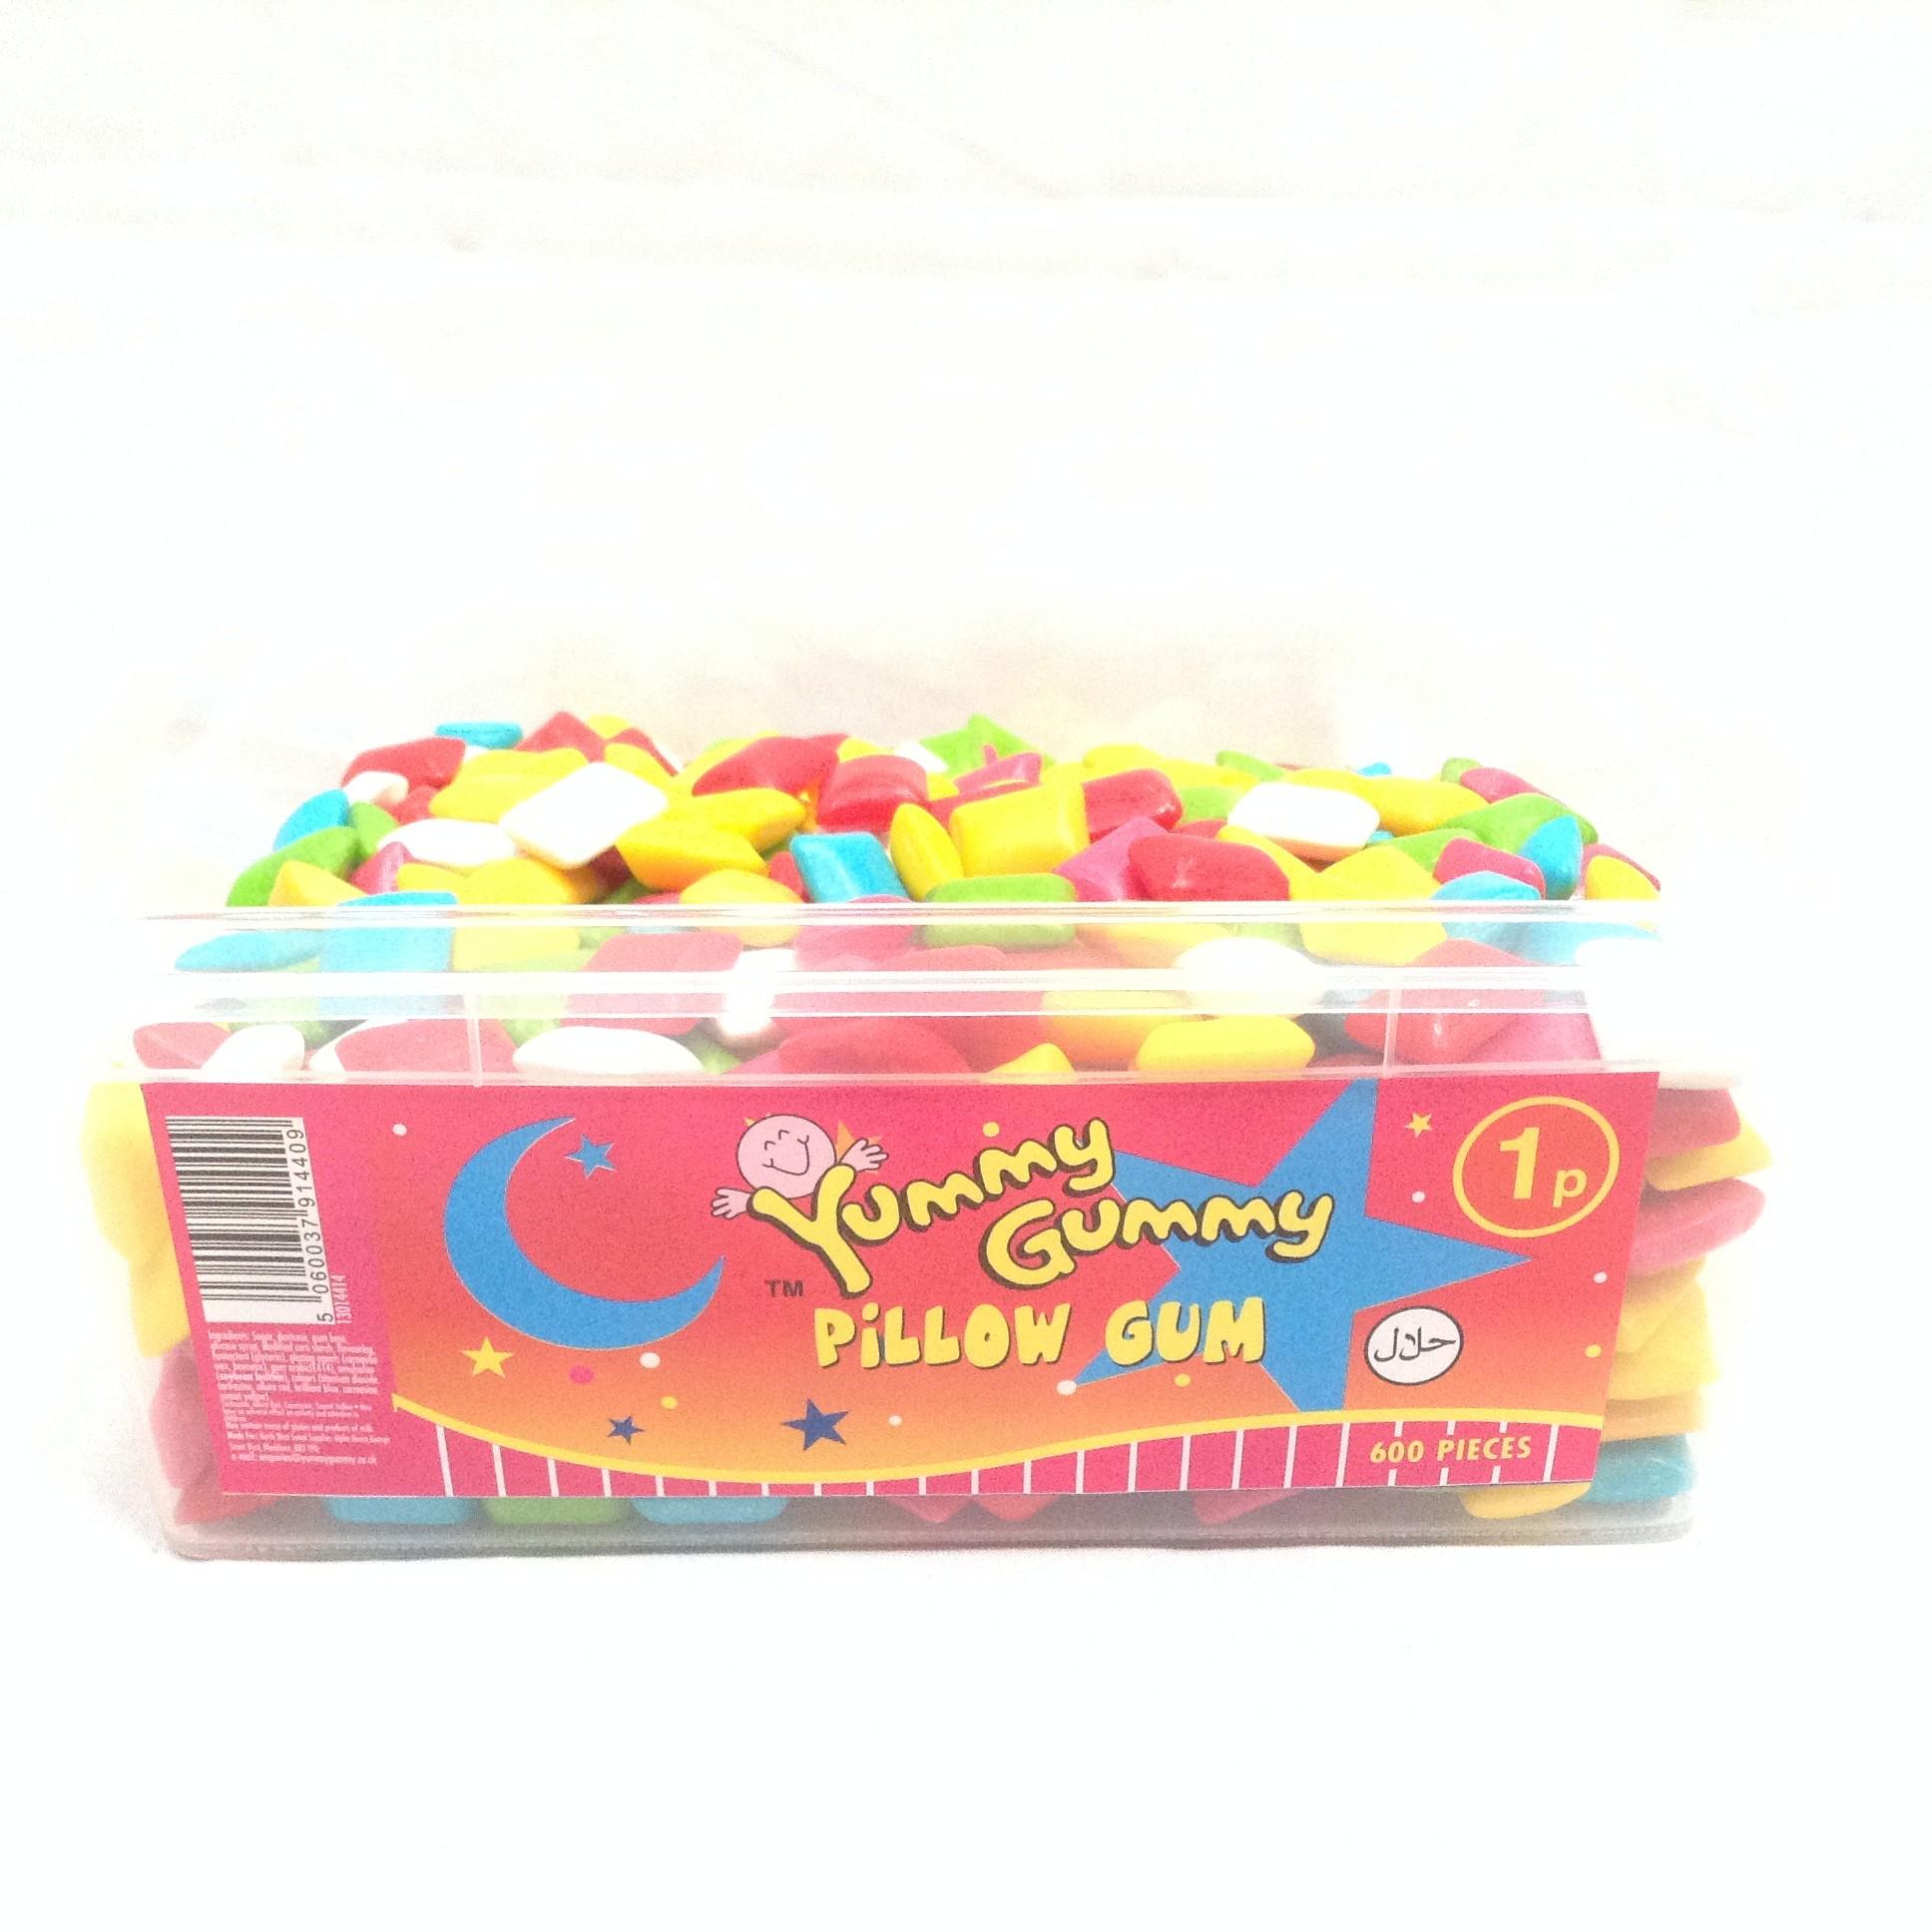 Yummy Gummy Bubble Gum Tub 1p Pillow - Tubs 1p - Sweets